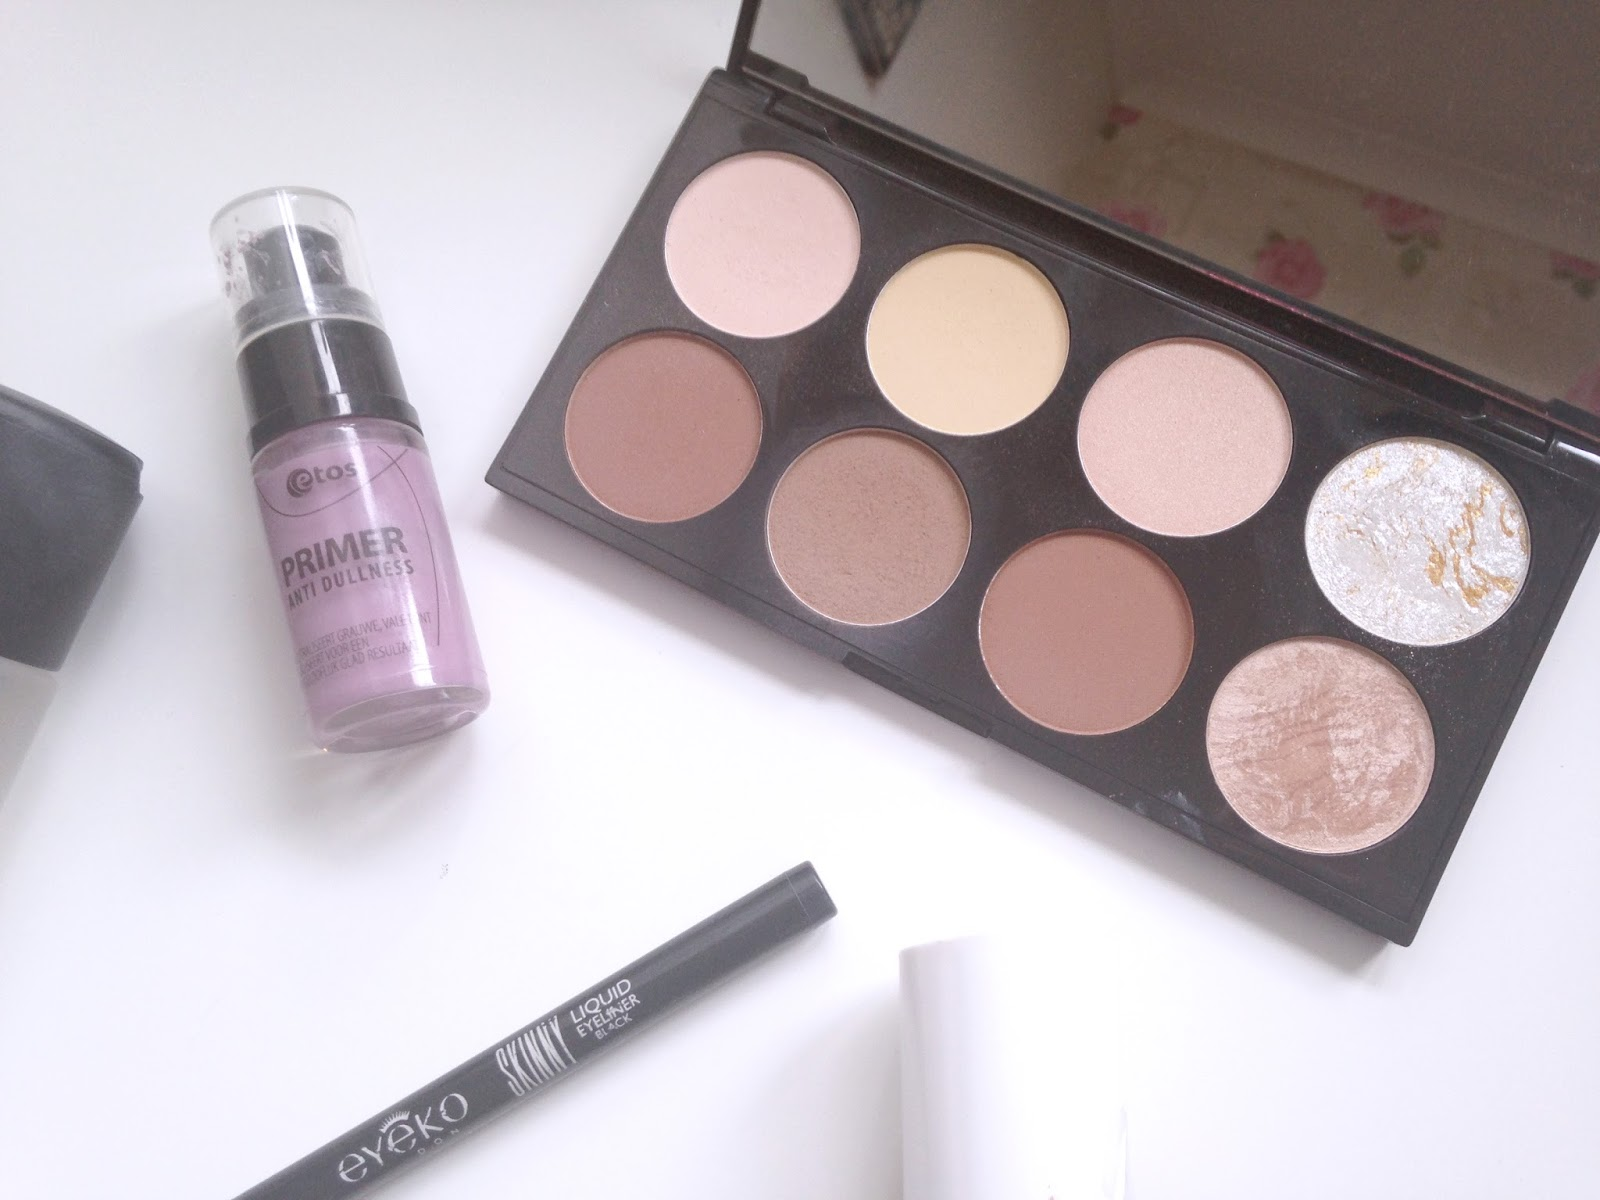 Etos Anti dullness primer Makeup Revolution Ultra Contour Kit Eyeko Skinny Liner